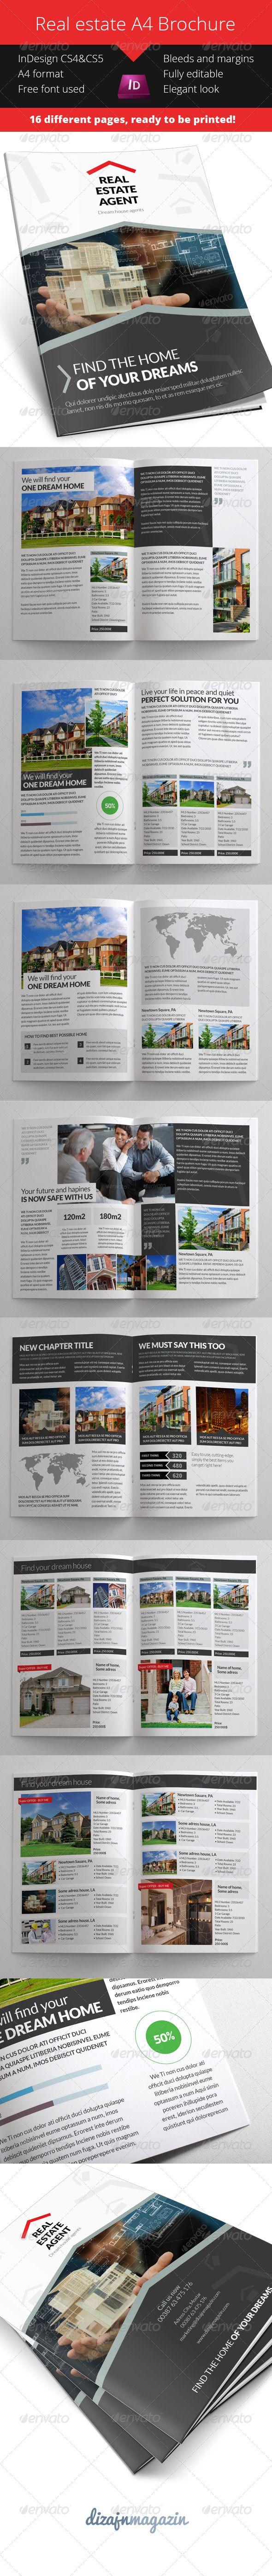 Real Estate Brochure Product Catalog 22